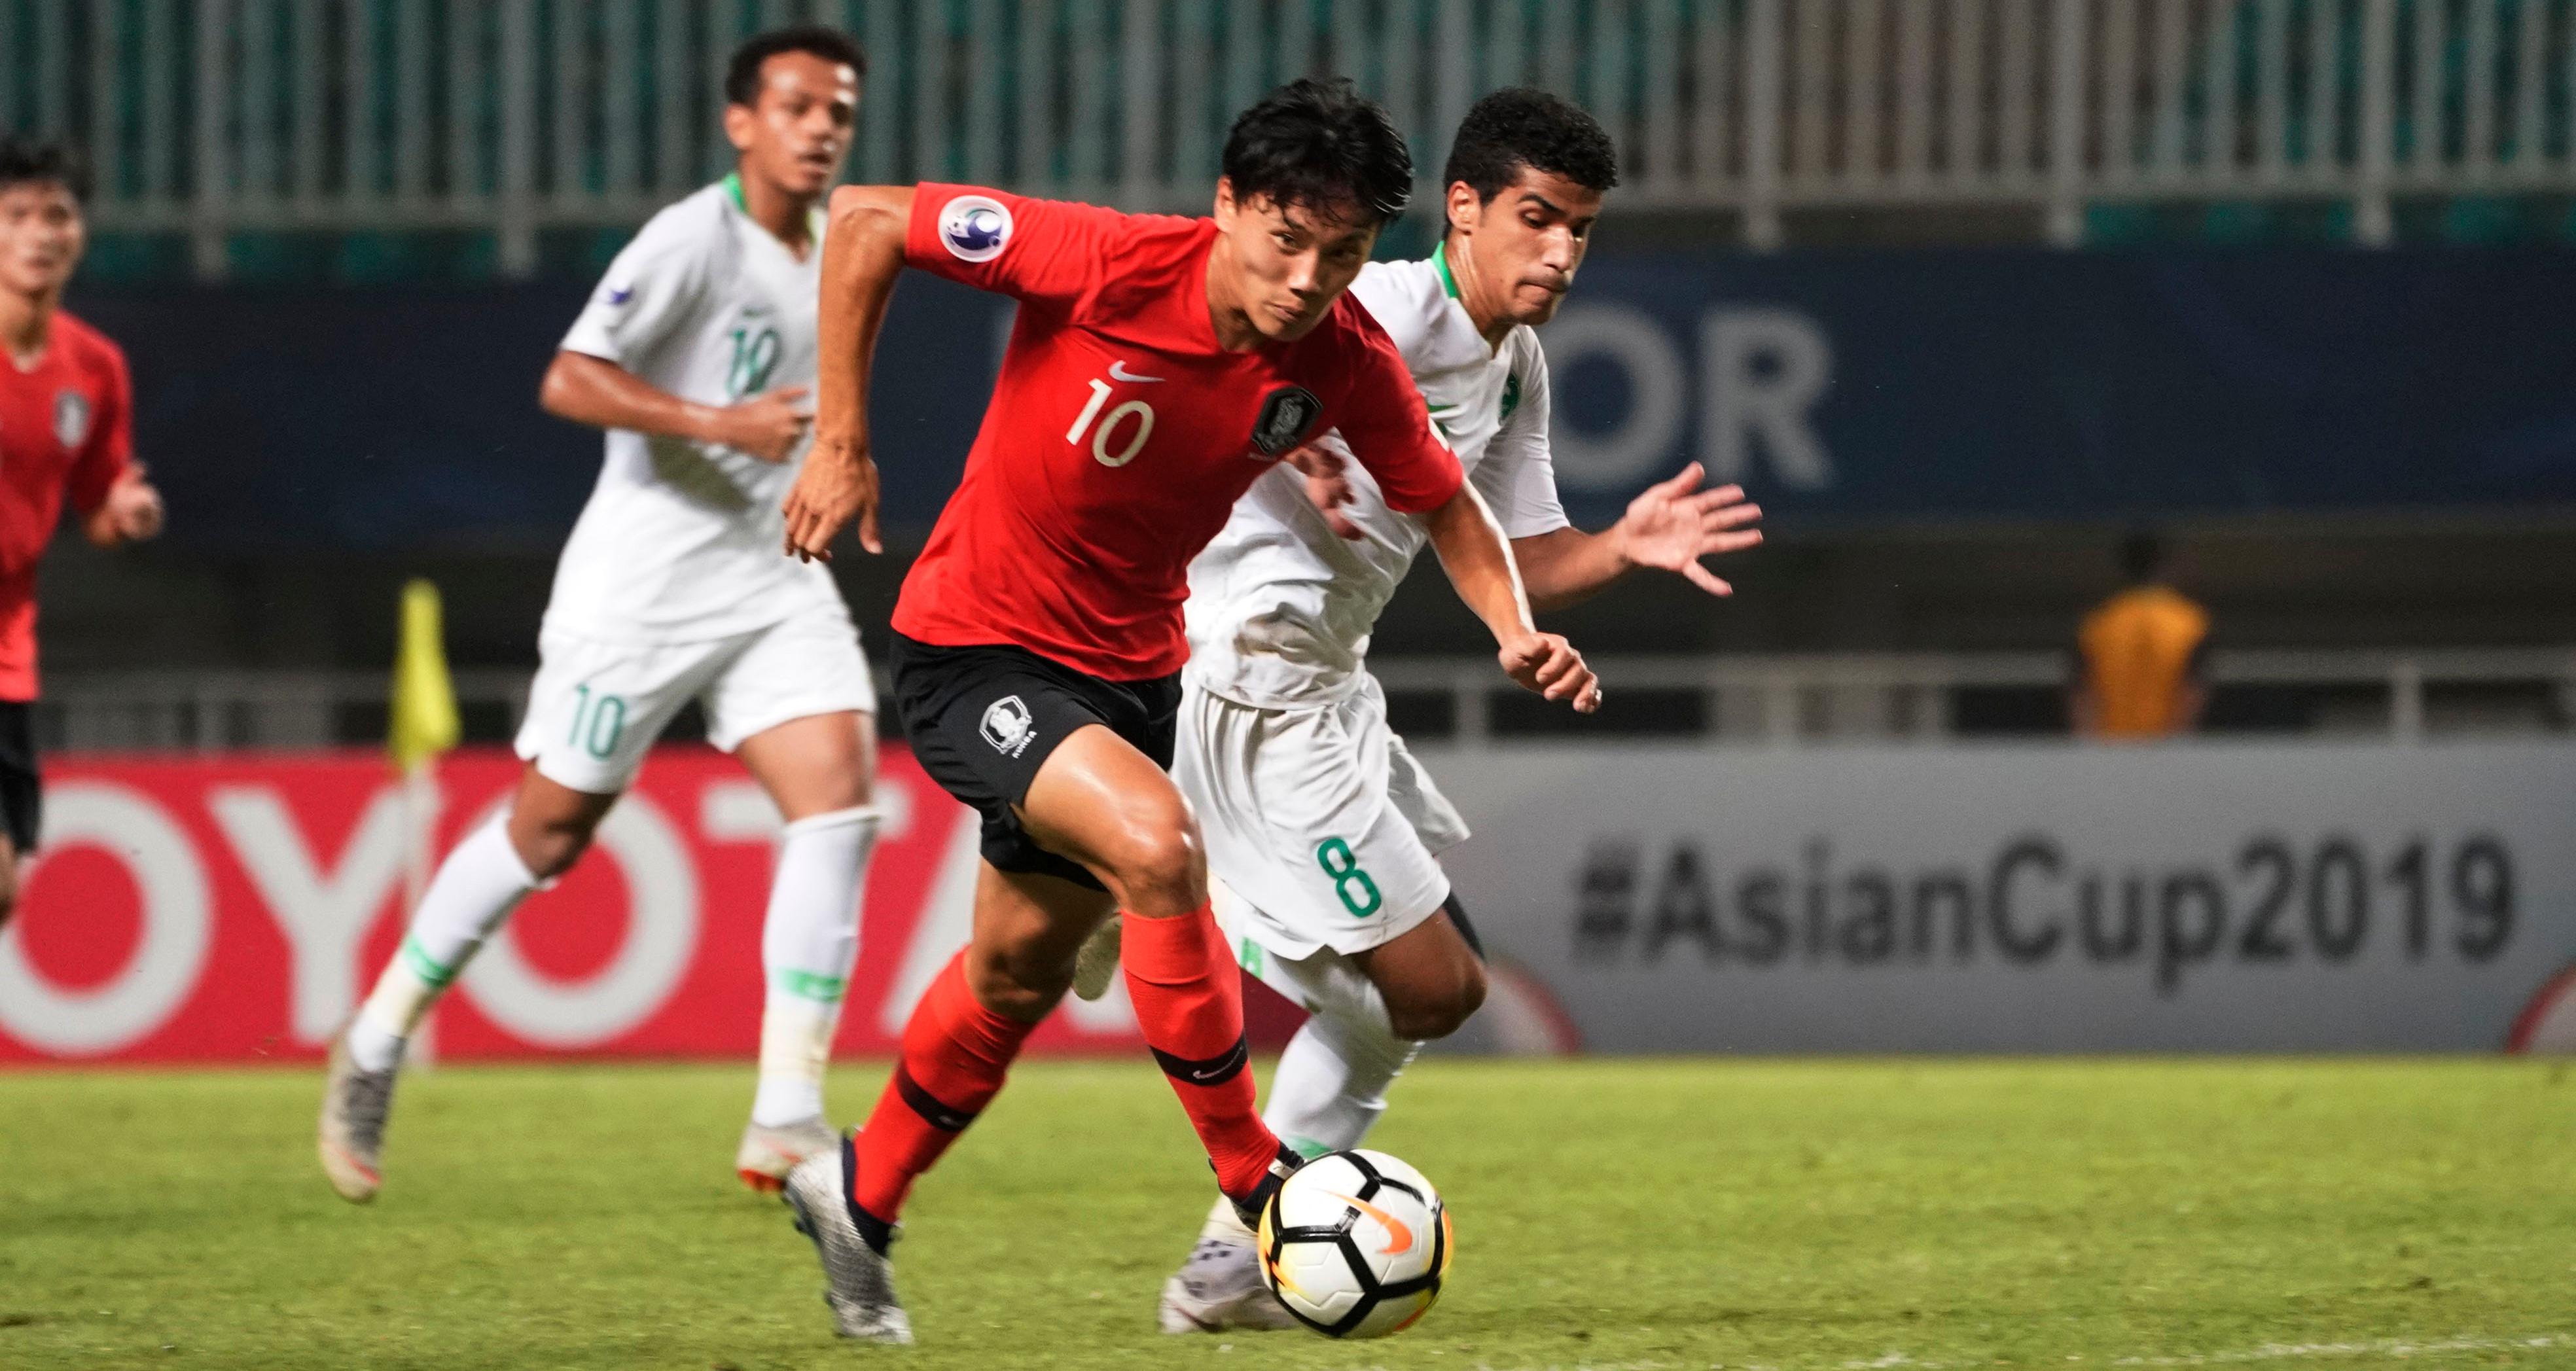 U19 Saudi Arabia U19 Hàn Quốc Chung kết giải U19 châu Á 2018